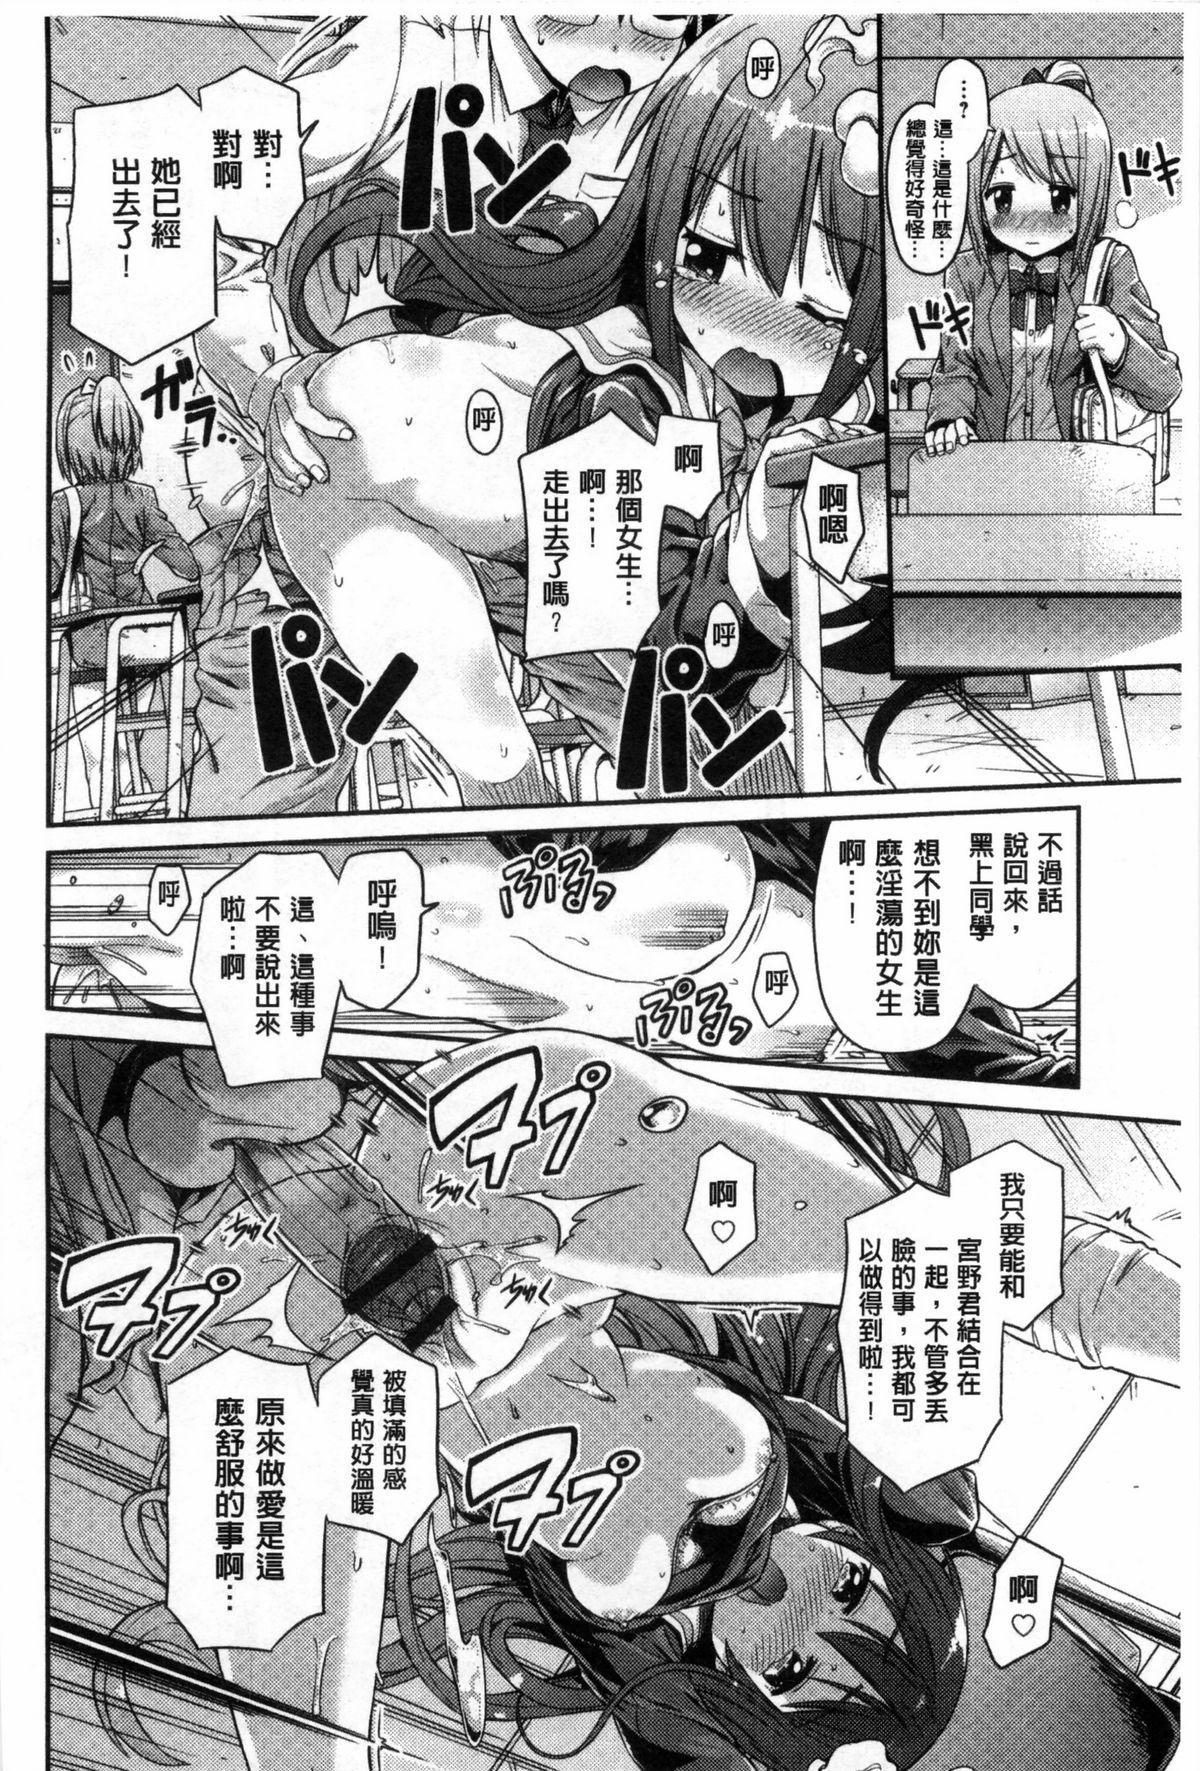 Man x Koi - Ero Manga de Hajimaru Koi no Plot   A漫×戀情 由情色漫畫所萌生的戀之物語 110